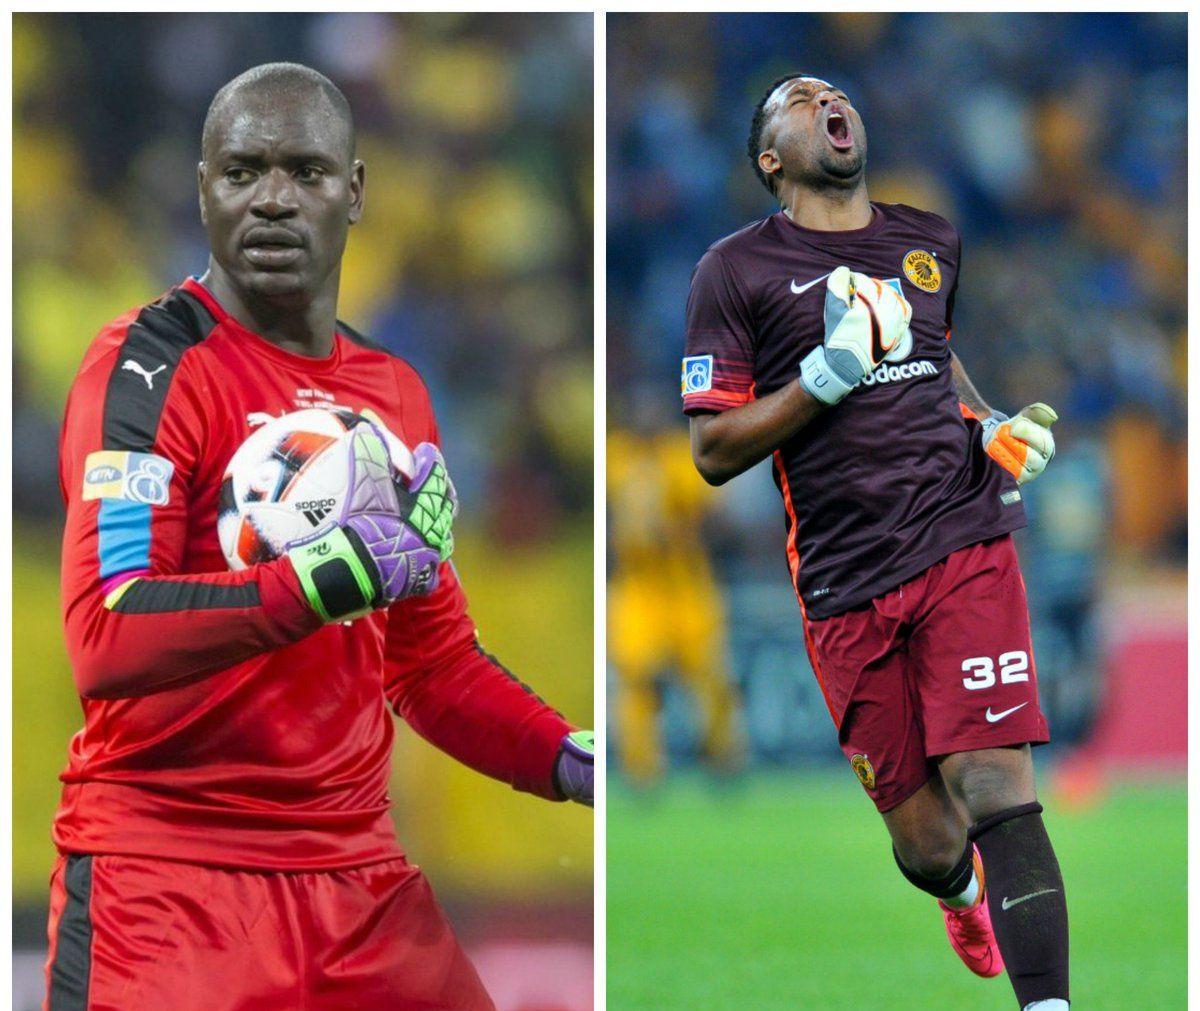 Itumeleng Khune agrees that Denis Onyango is the best goalkeeper in PSL